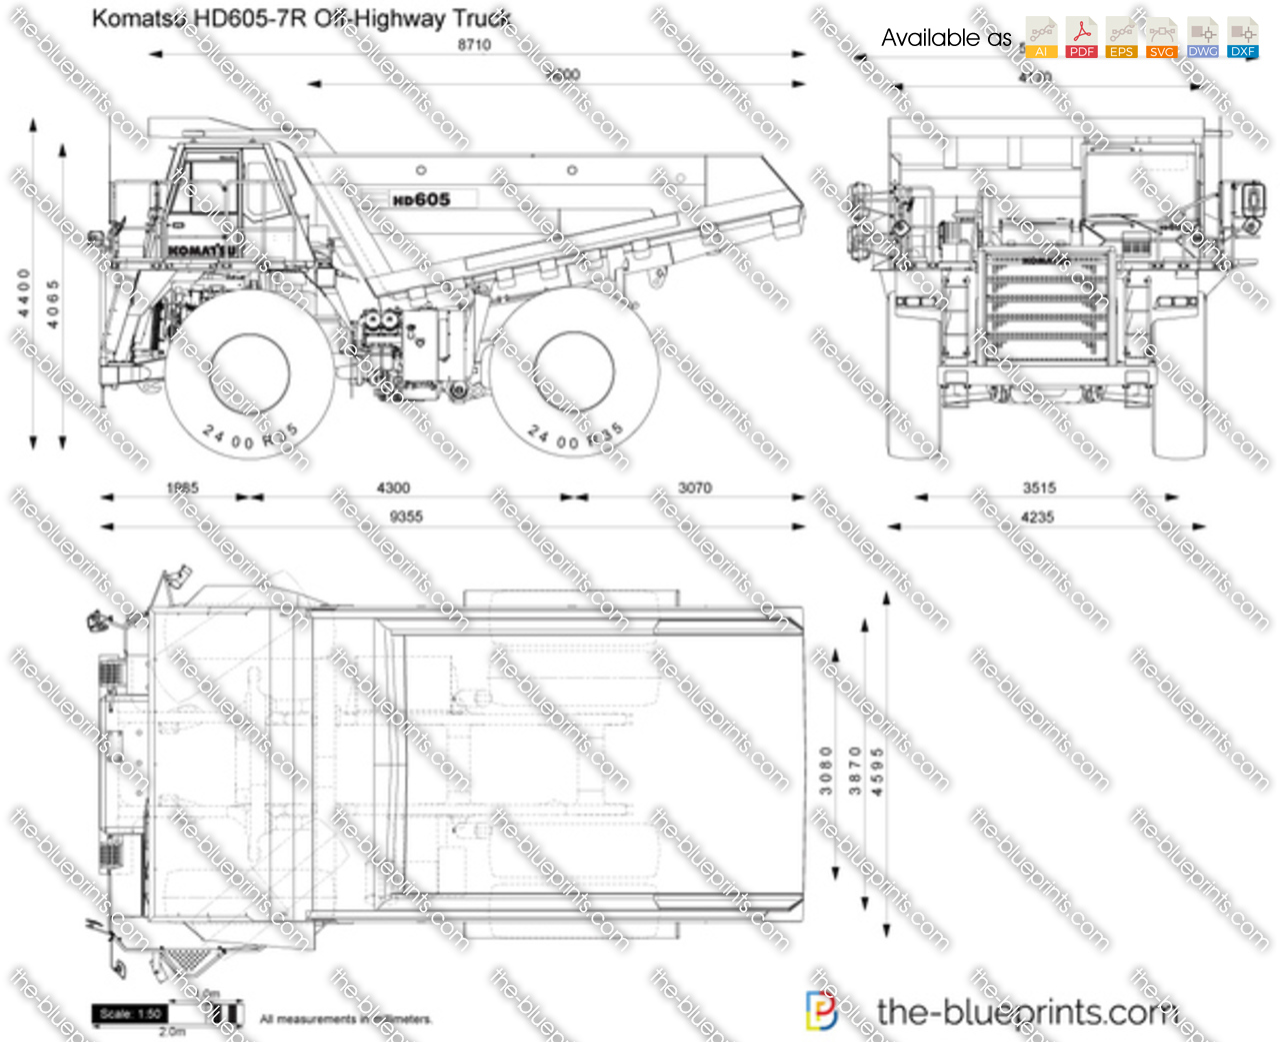 Komatsu HD605-7R Off-Highway Truck